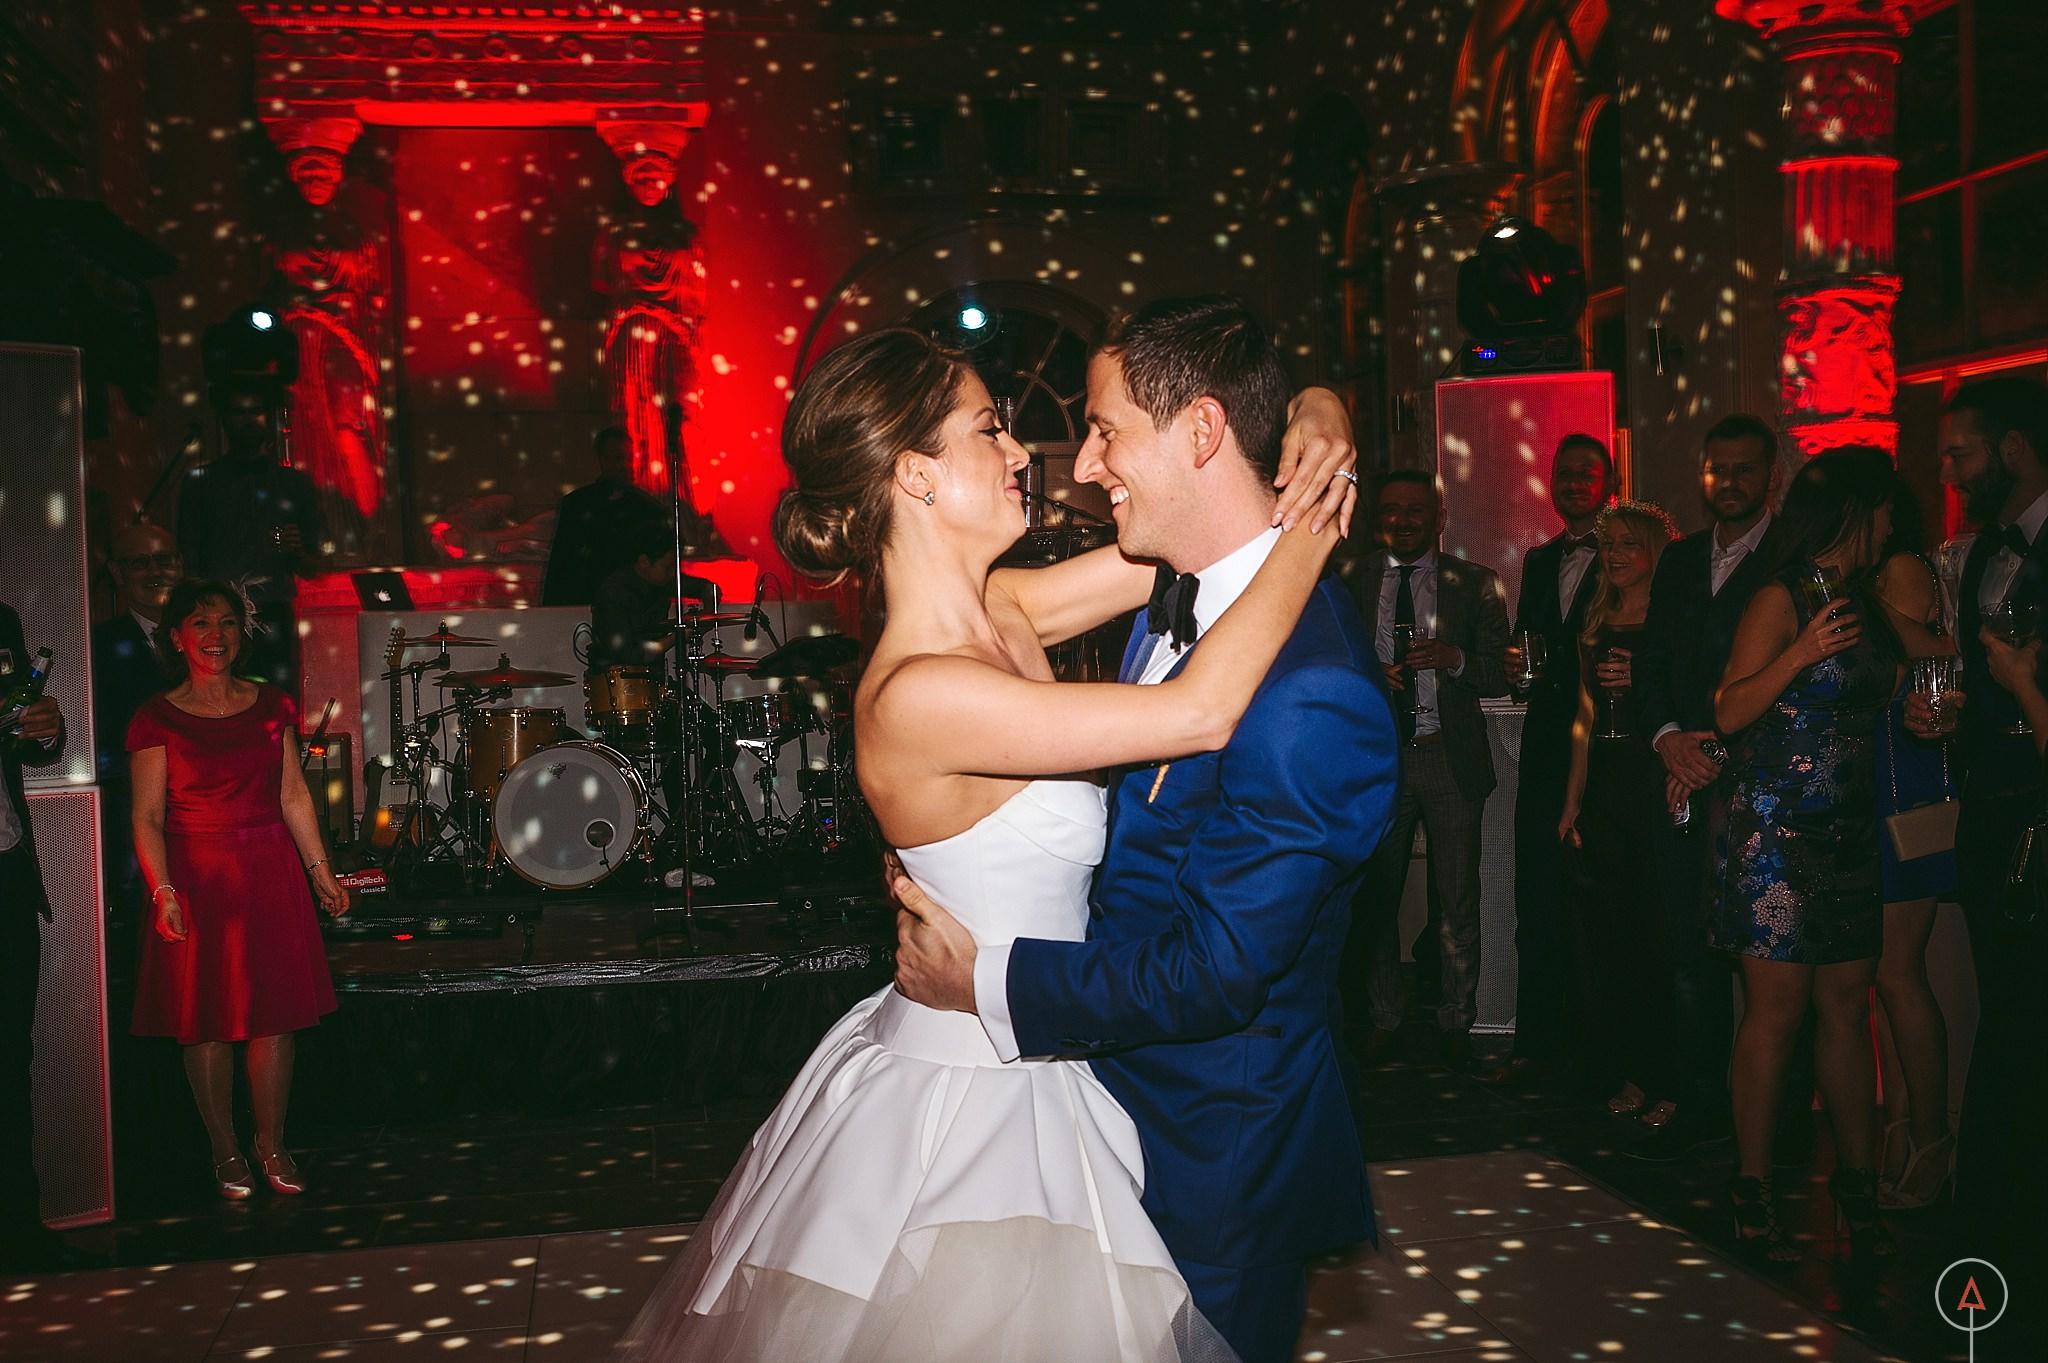 cardiff-wedding-photographer-aga-tomaszek_0312